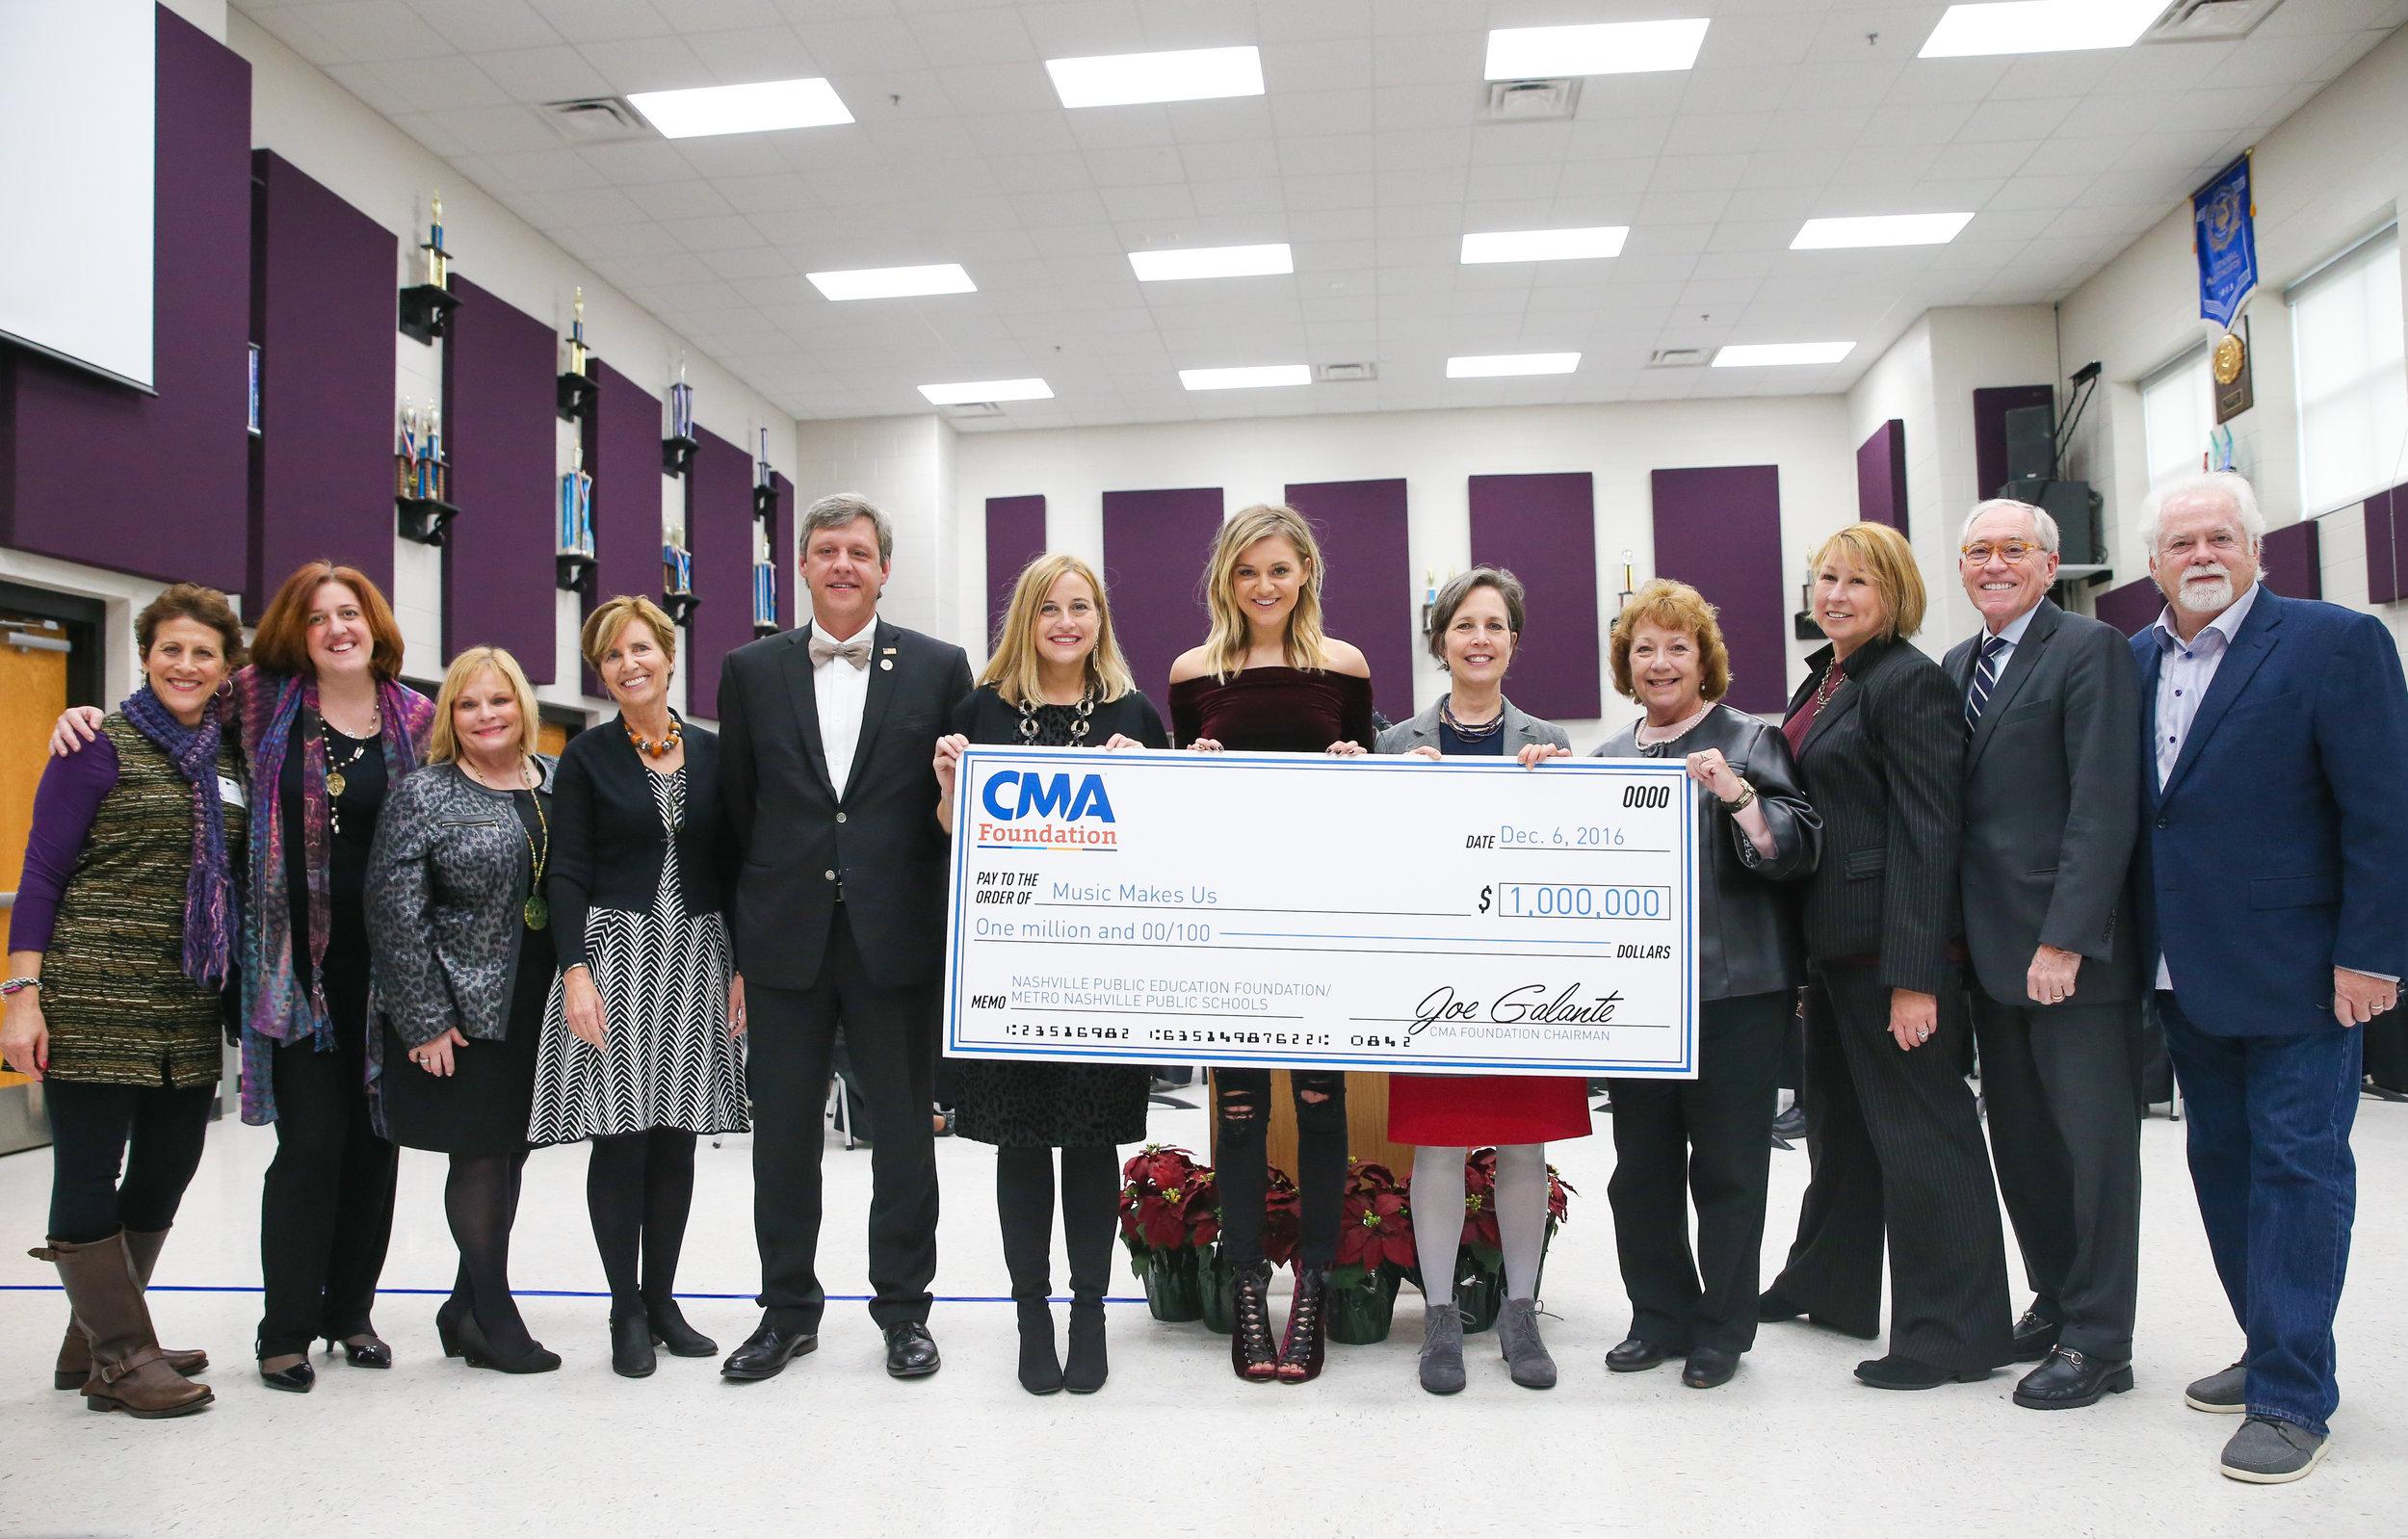 Kelsea Ballerini And CMA Foundation Announcement